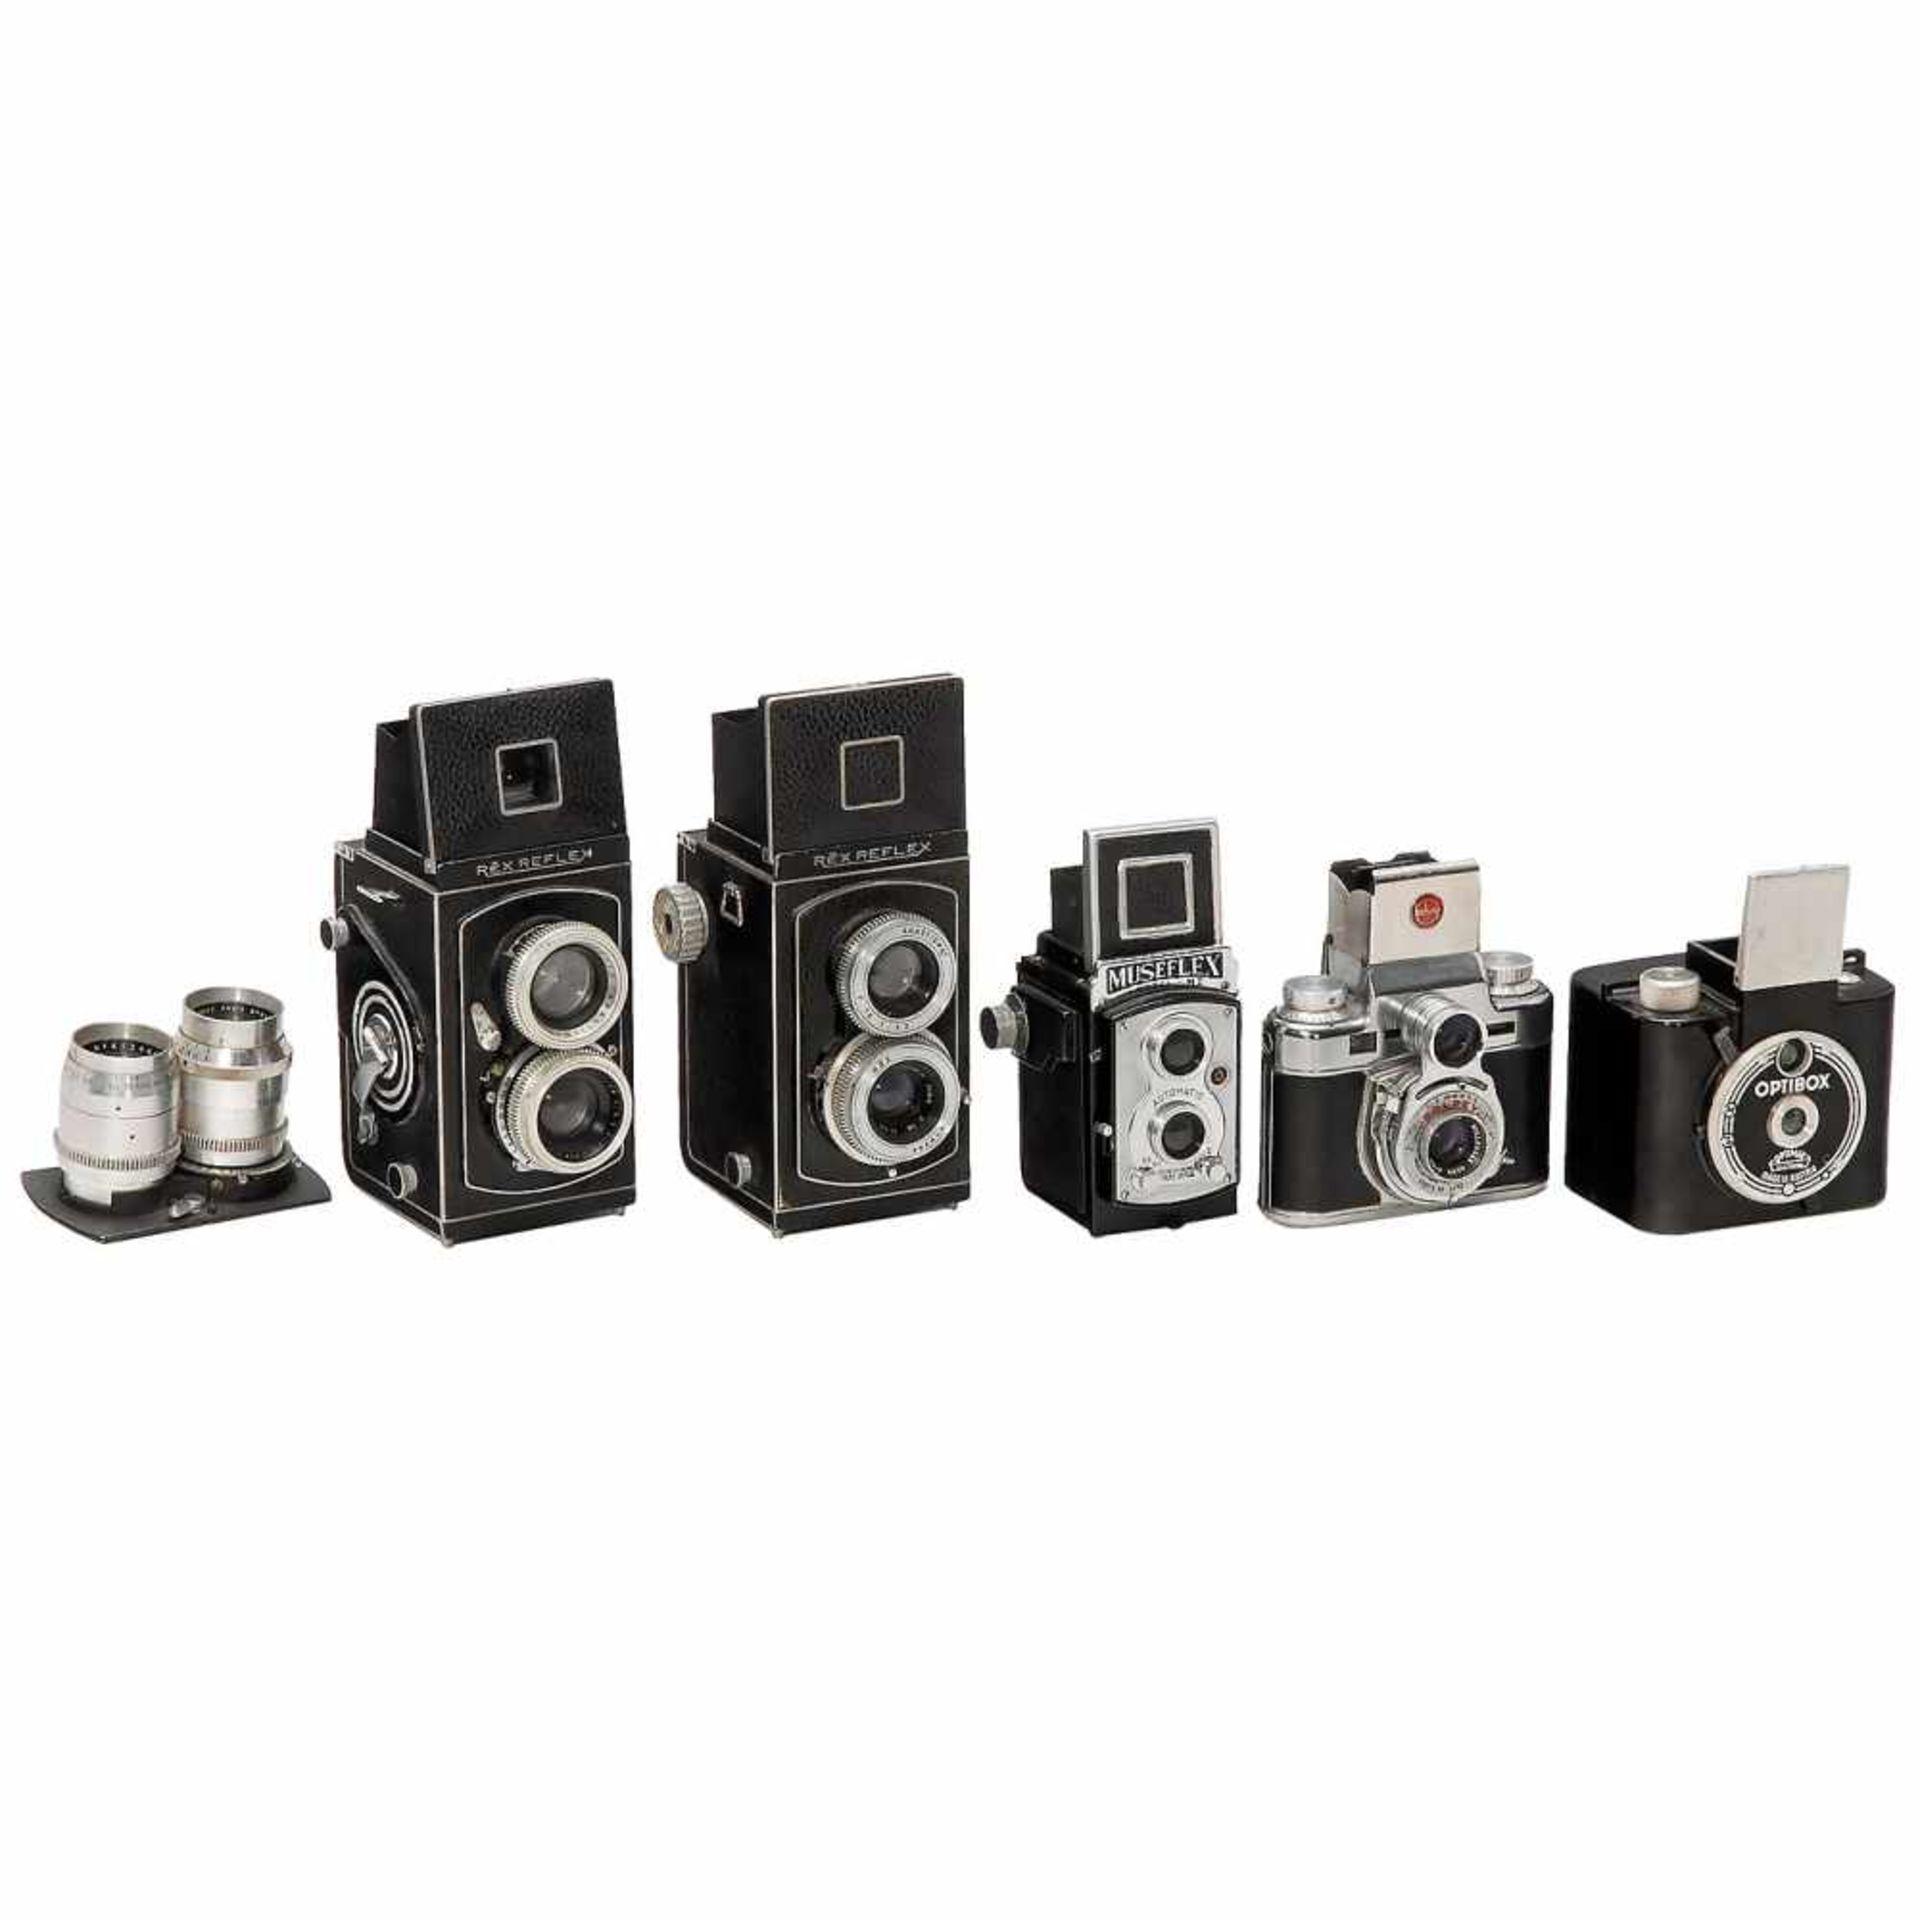 5 Binocular Cameras1–2) Photorex, France. Rex Reflex B2 and Reflex Standard, c. 1951, 1 x with